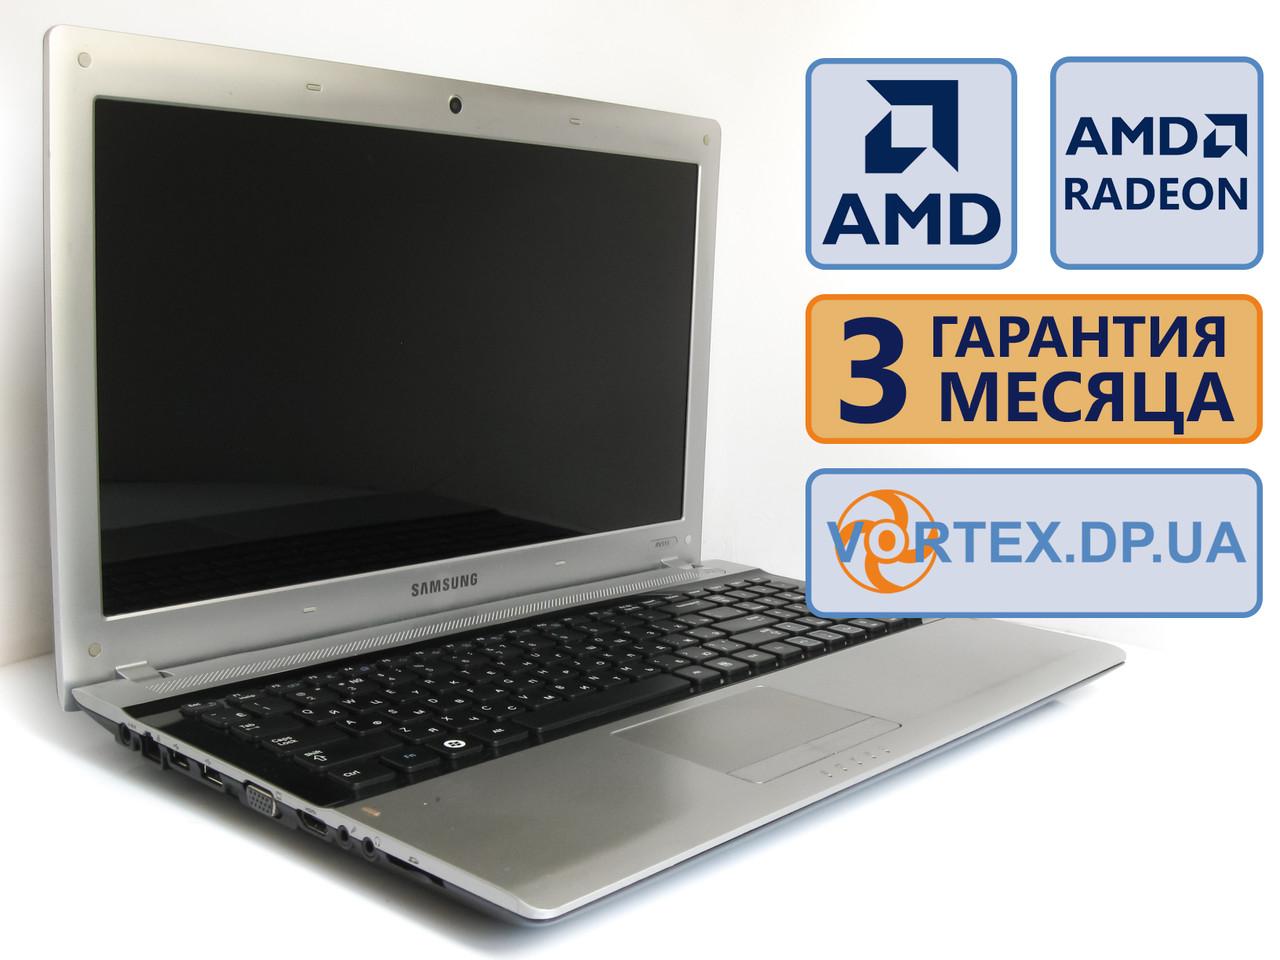 Ноутбук Samsung RV509 15.6 (1366x768) / AMD E-450 (2x1.66GHz) / RAM 3G